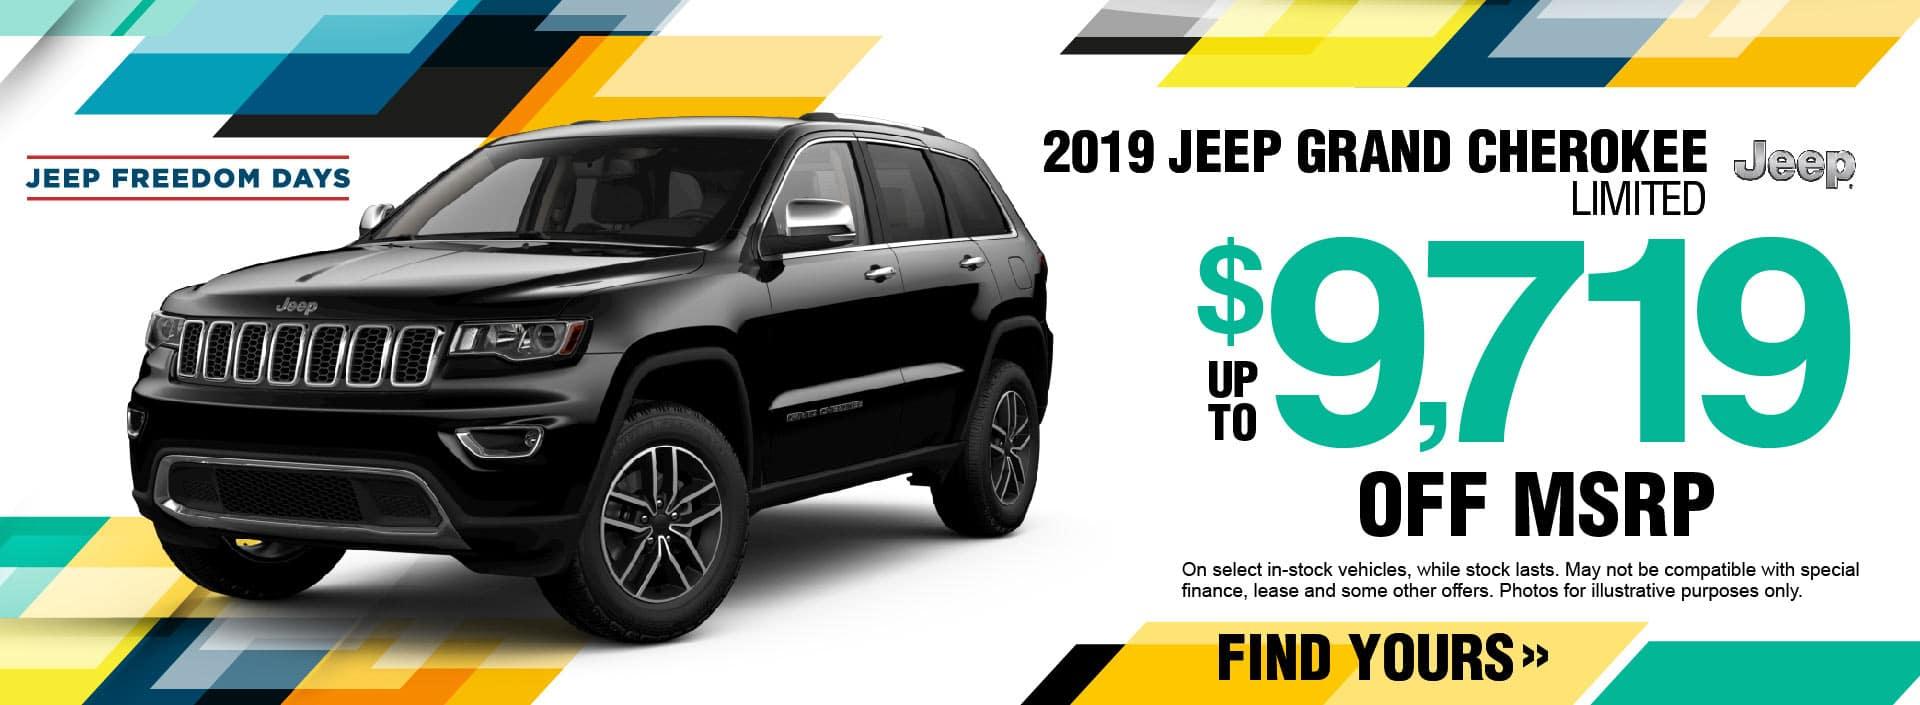 2019 Jeep Grand Cherokee Savings